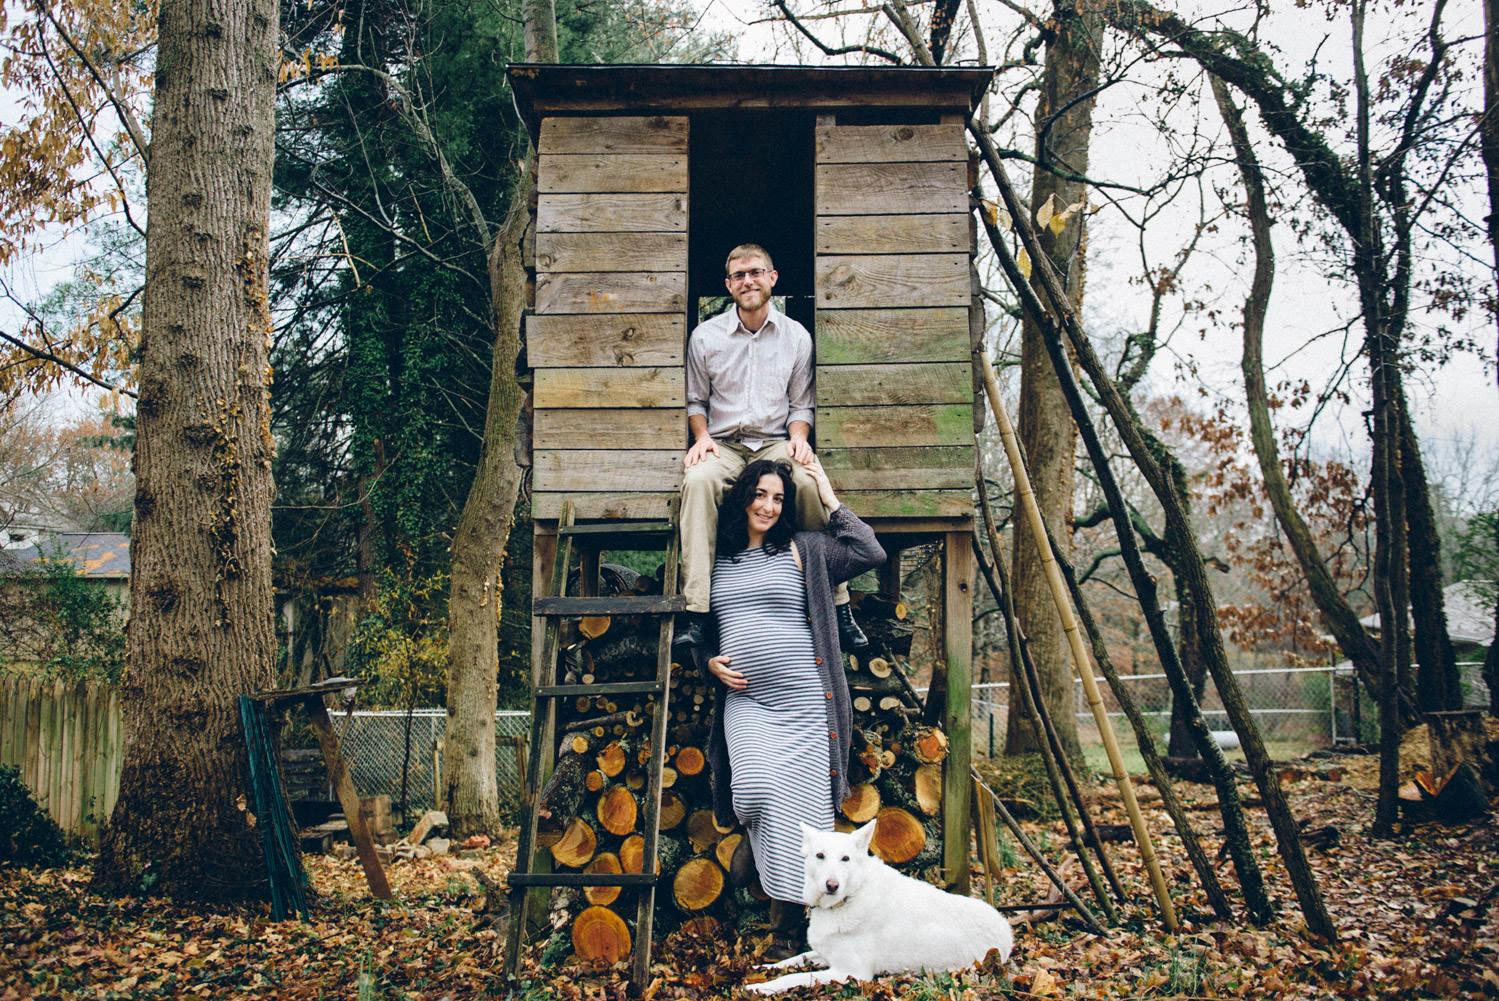 maternityphotography_ashevillenorthcarolina_austendiamondphotography-2